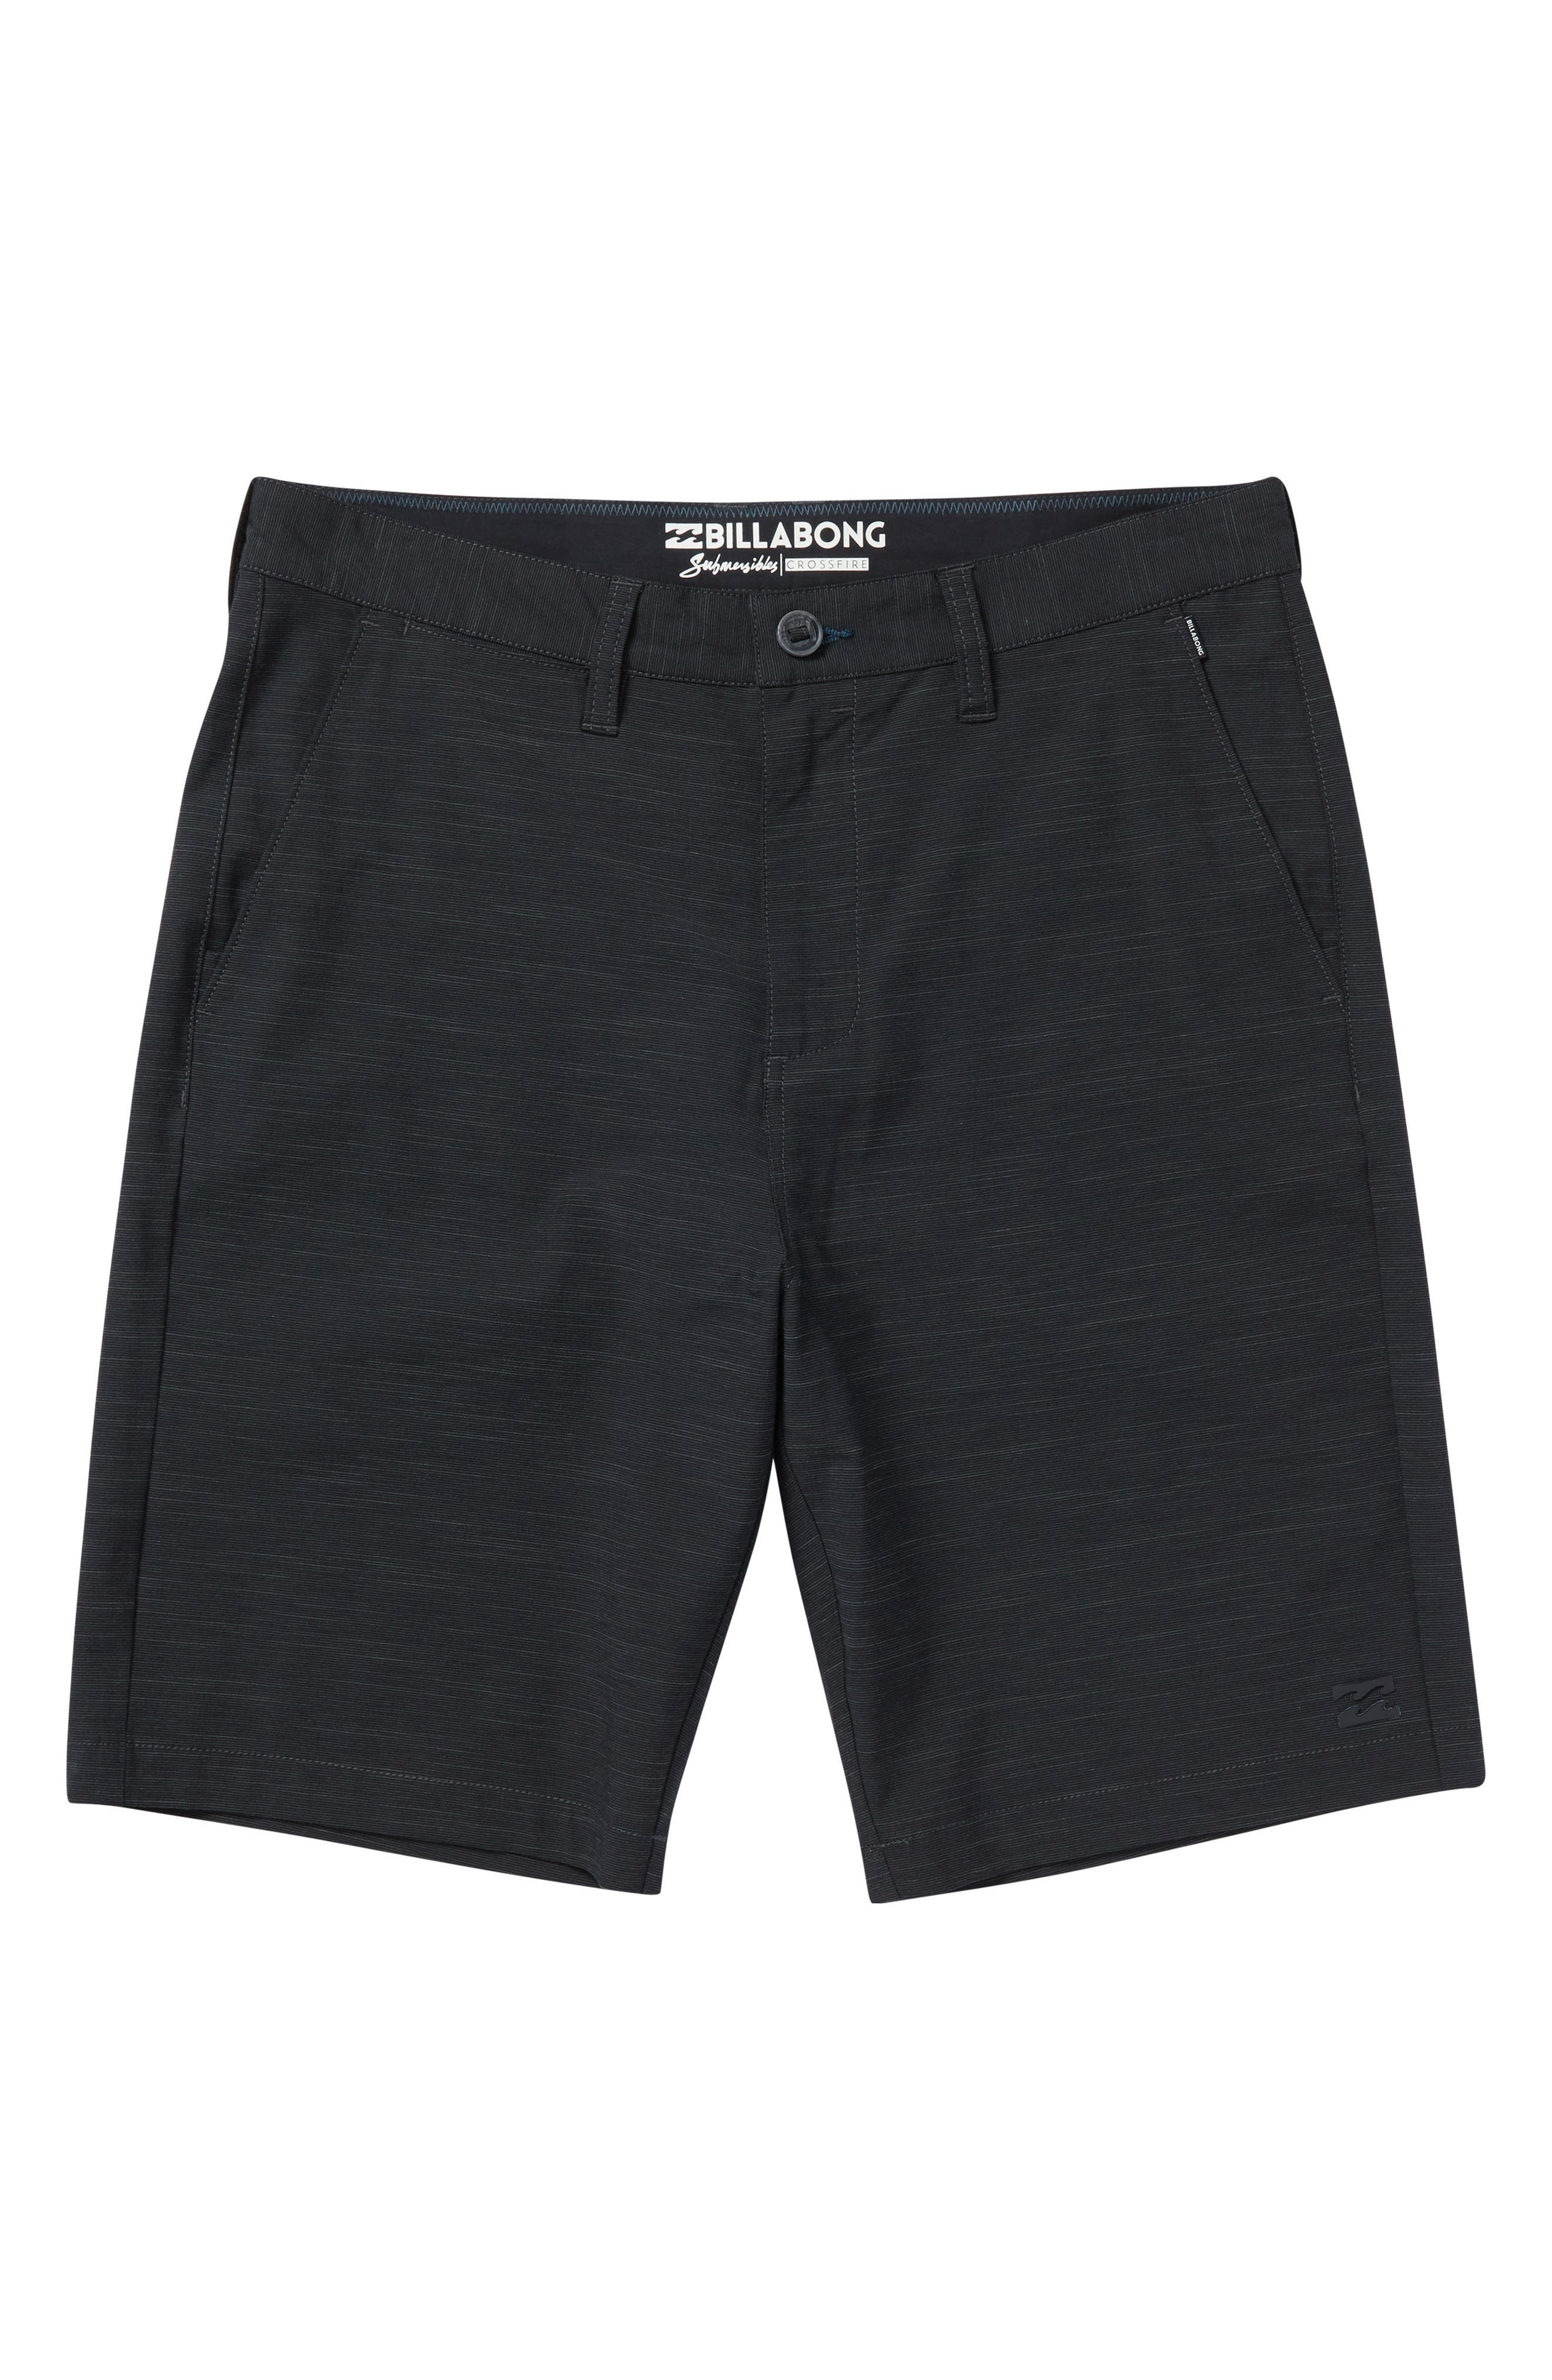 Crossfire X Hybrid Shorts,                             Main thumbnail 1, color,                             001